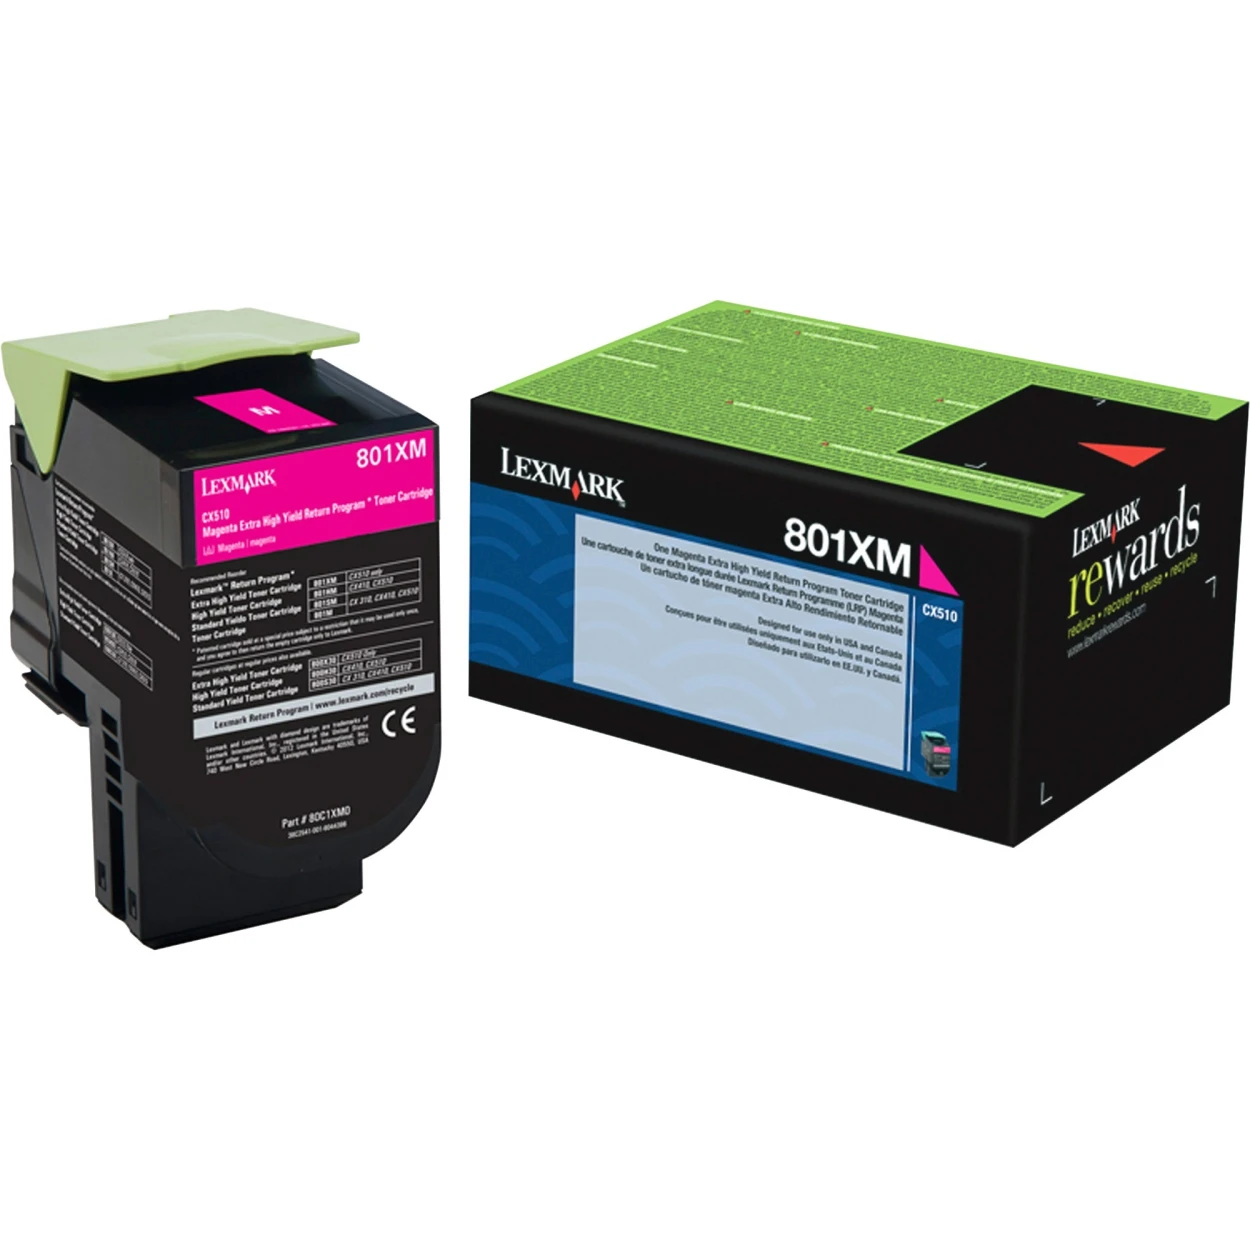 Original Lexmark 80C1XM0 801XM Management Return Program Extra High-Yield Toner Cartridge Unison